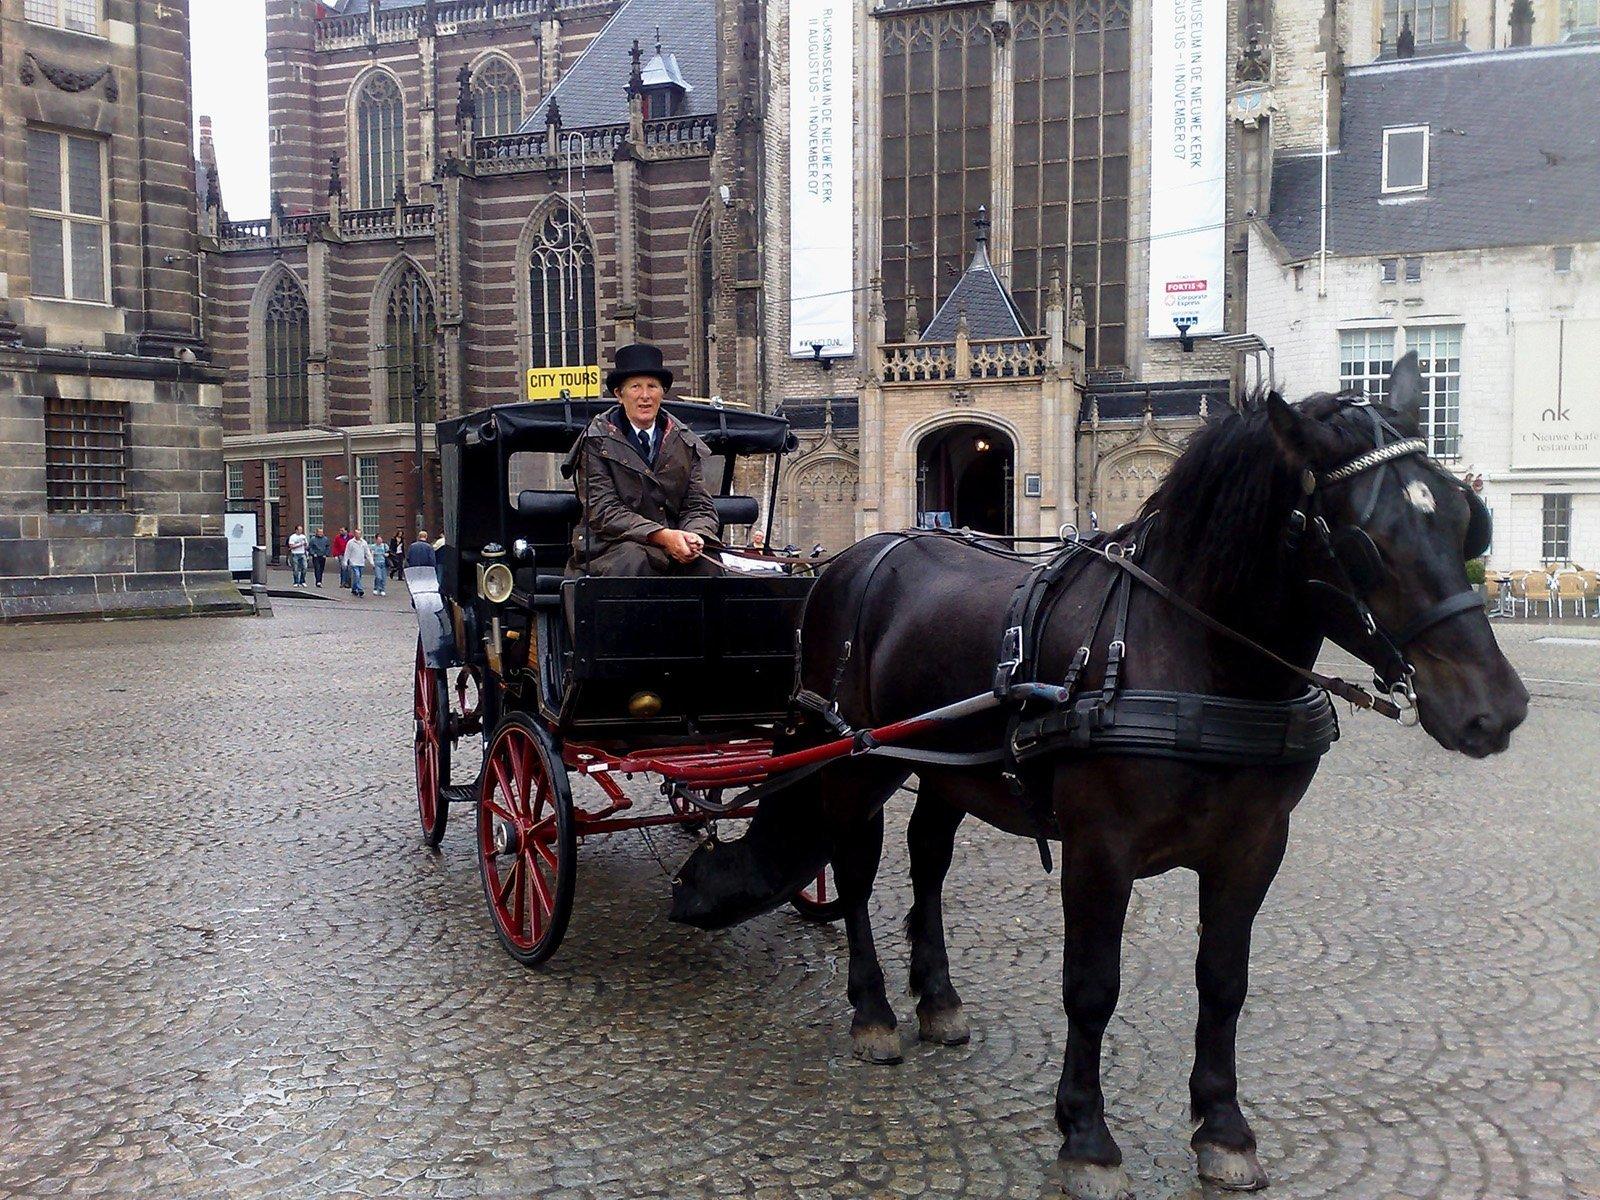 amsterdam ve paytoncu